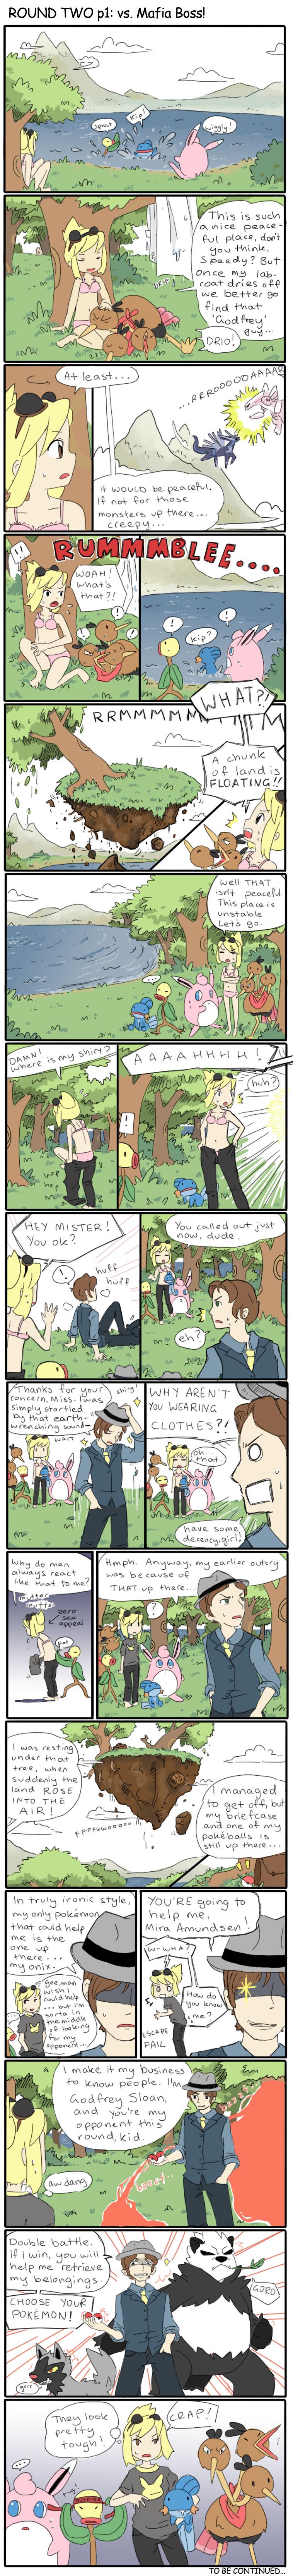 DOCT round 2 page 1: VERSUS MAFIA BOSS! by SilkenCat